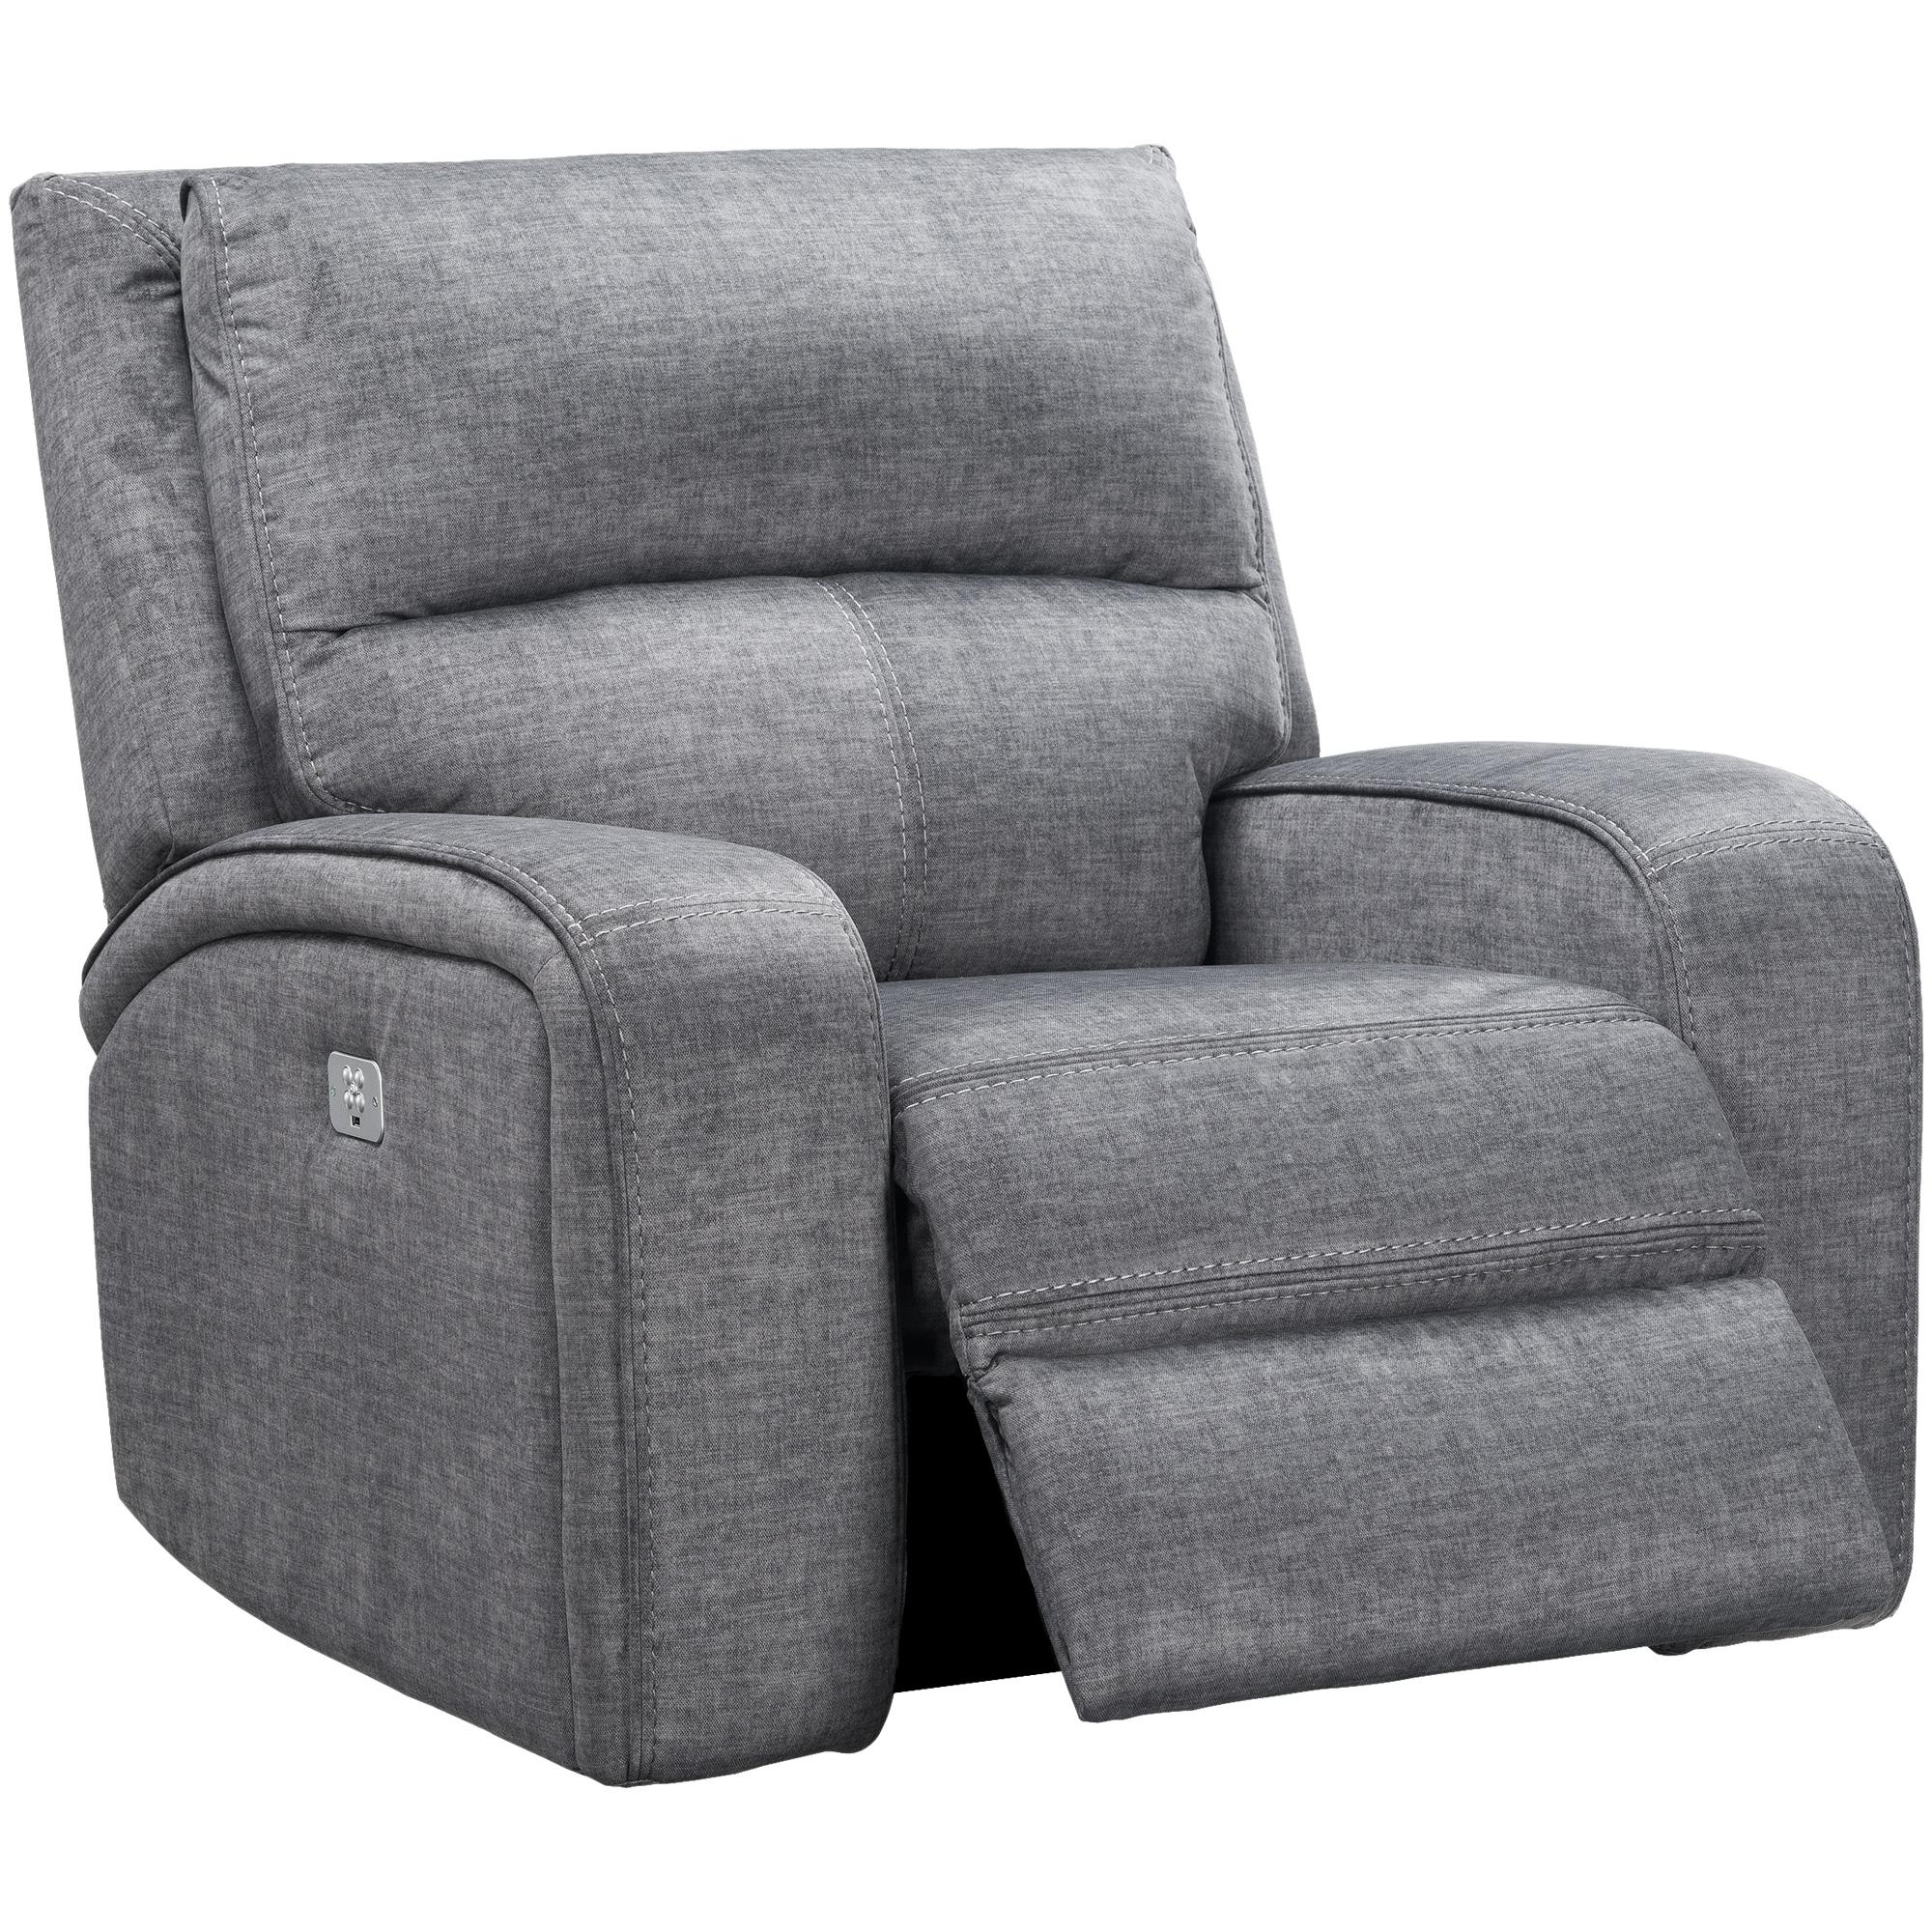 Wah Cheers | Cordova Charcoal Power+ Recliner Chair